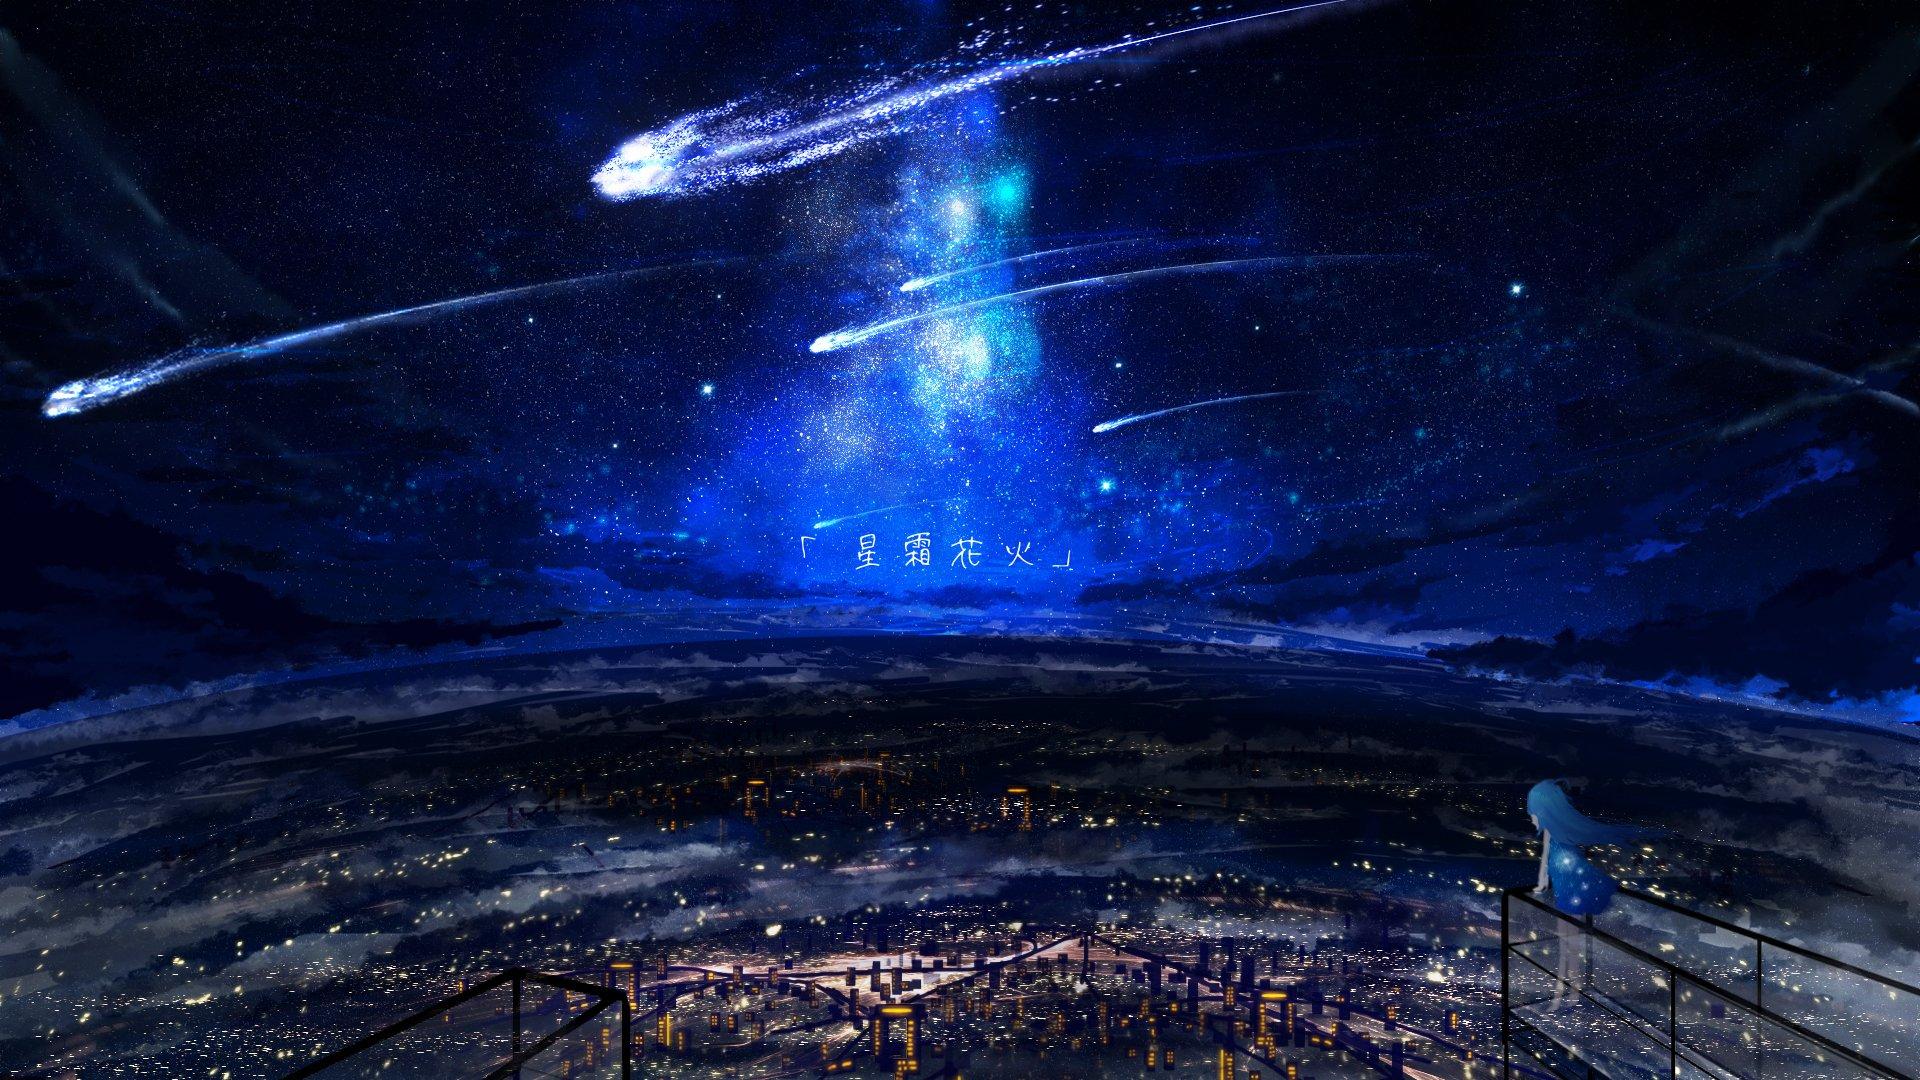 Falling Star Wallpaper Hd Y Y On Twitter Quot 七夕なので 星空イラスト